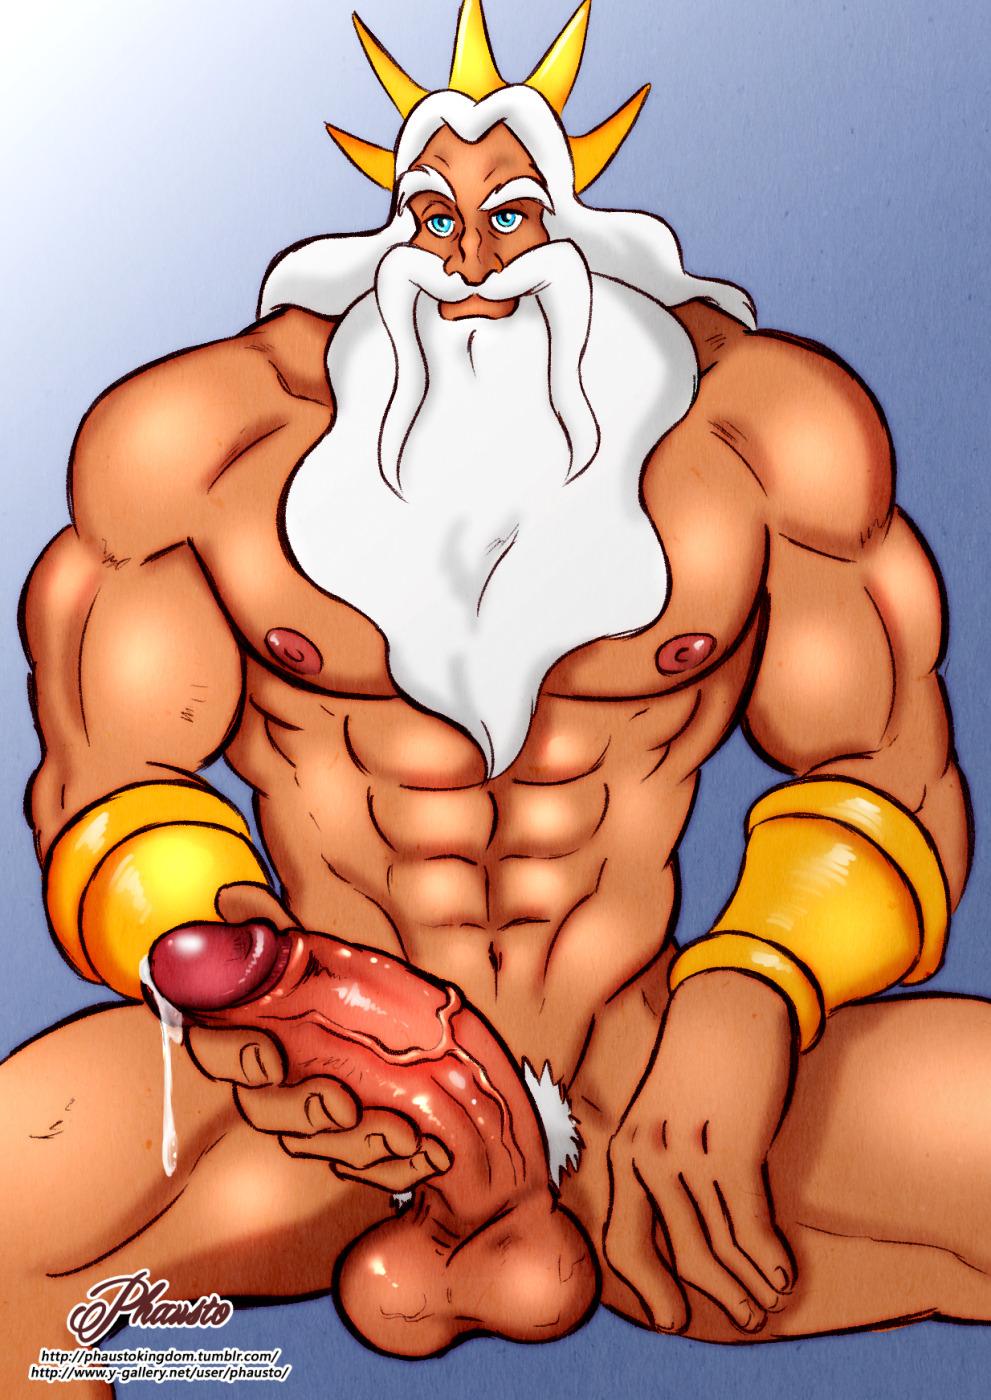 1_boy 1_human 1_male 1boy 1male 1man abs beard big_penis disney erect_penis erection huge_penis human king_triton mature mature_male muscle muscles penis precum testicle testicles